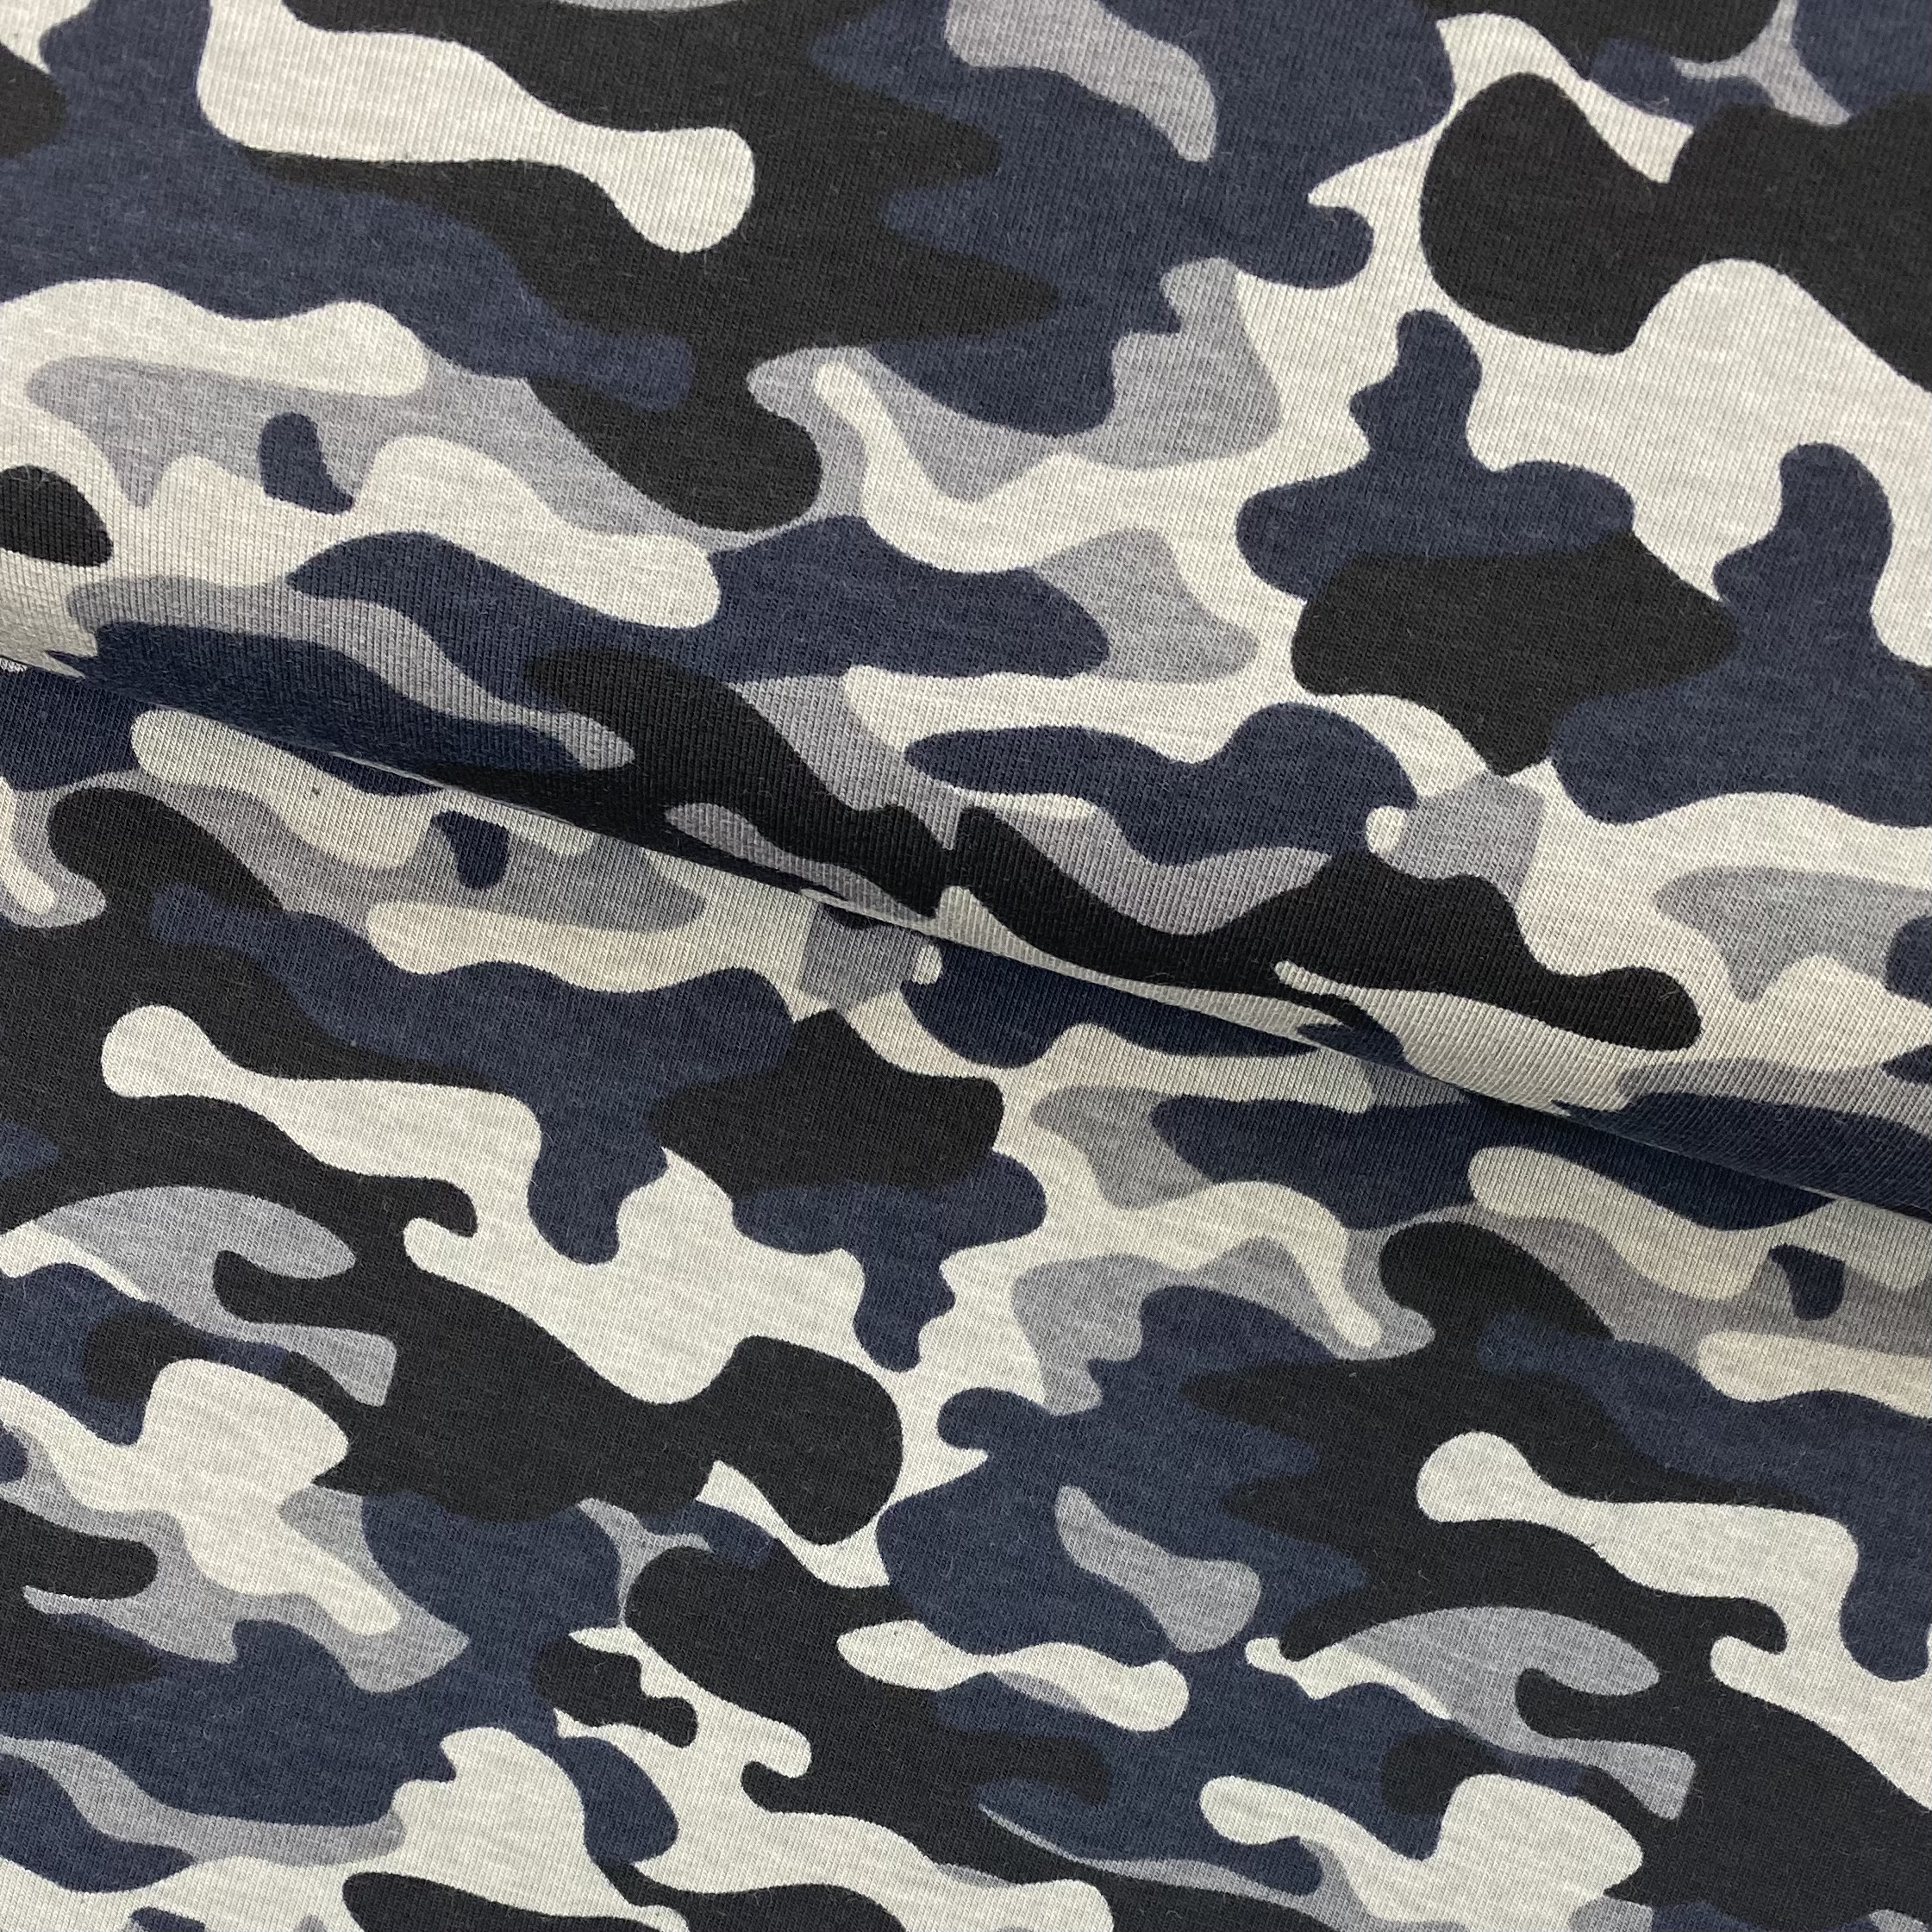 Baumwolljersey, Camouflage dunkelblau, Art. 340084.002